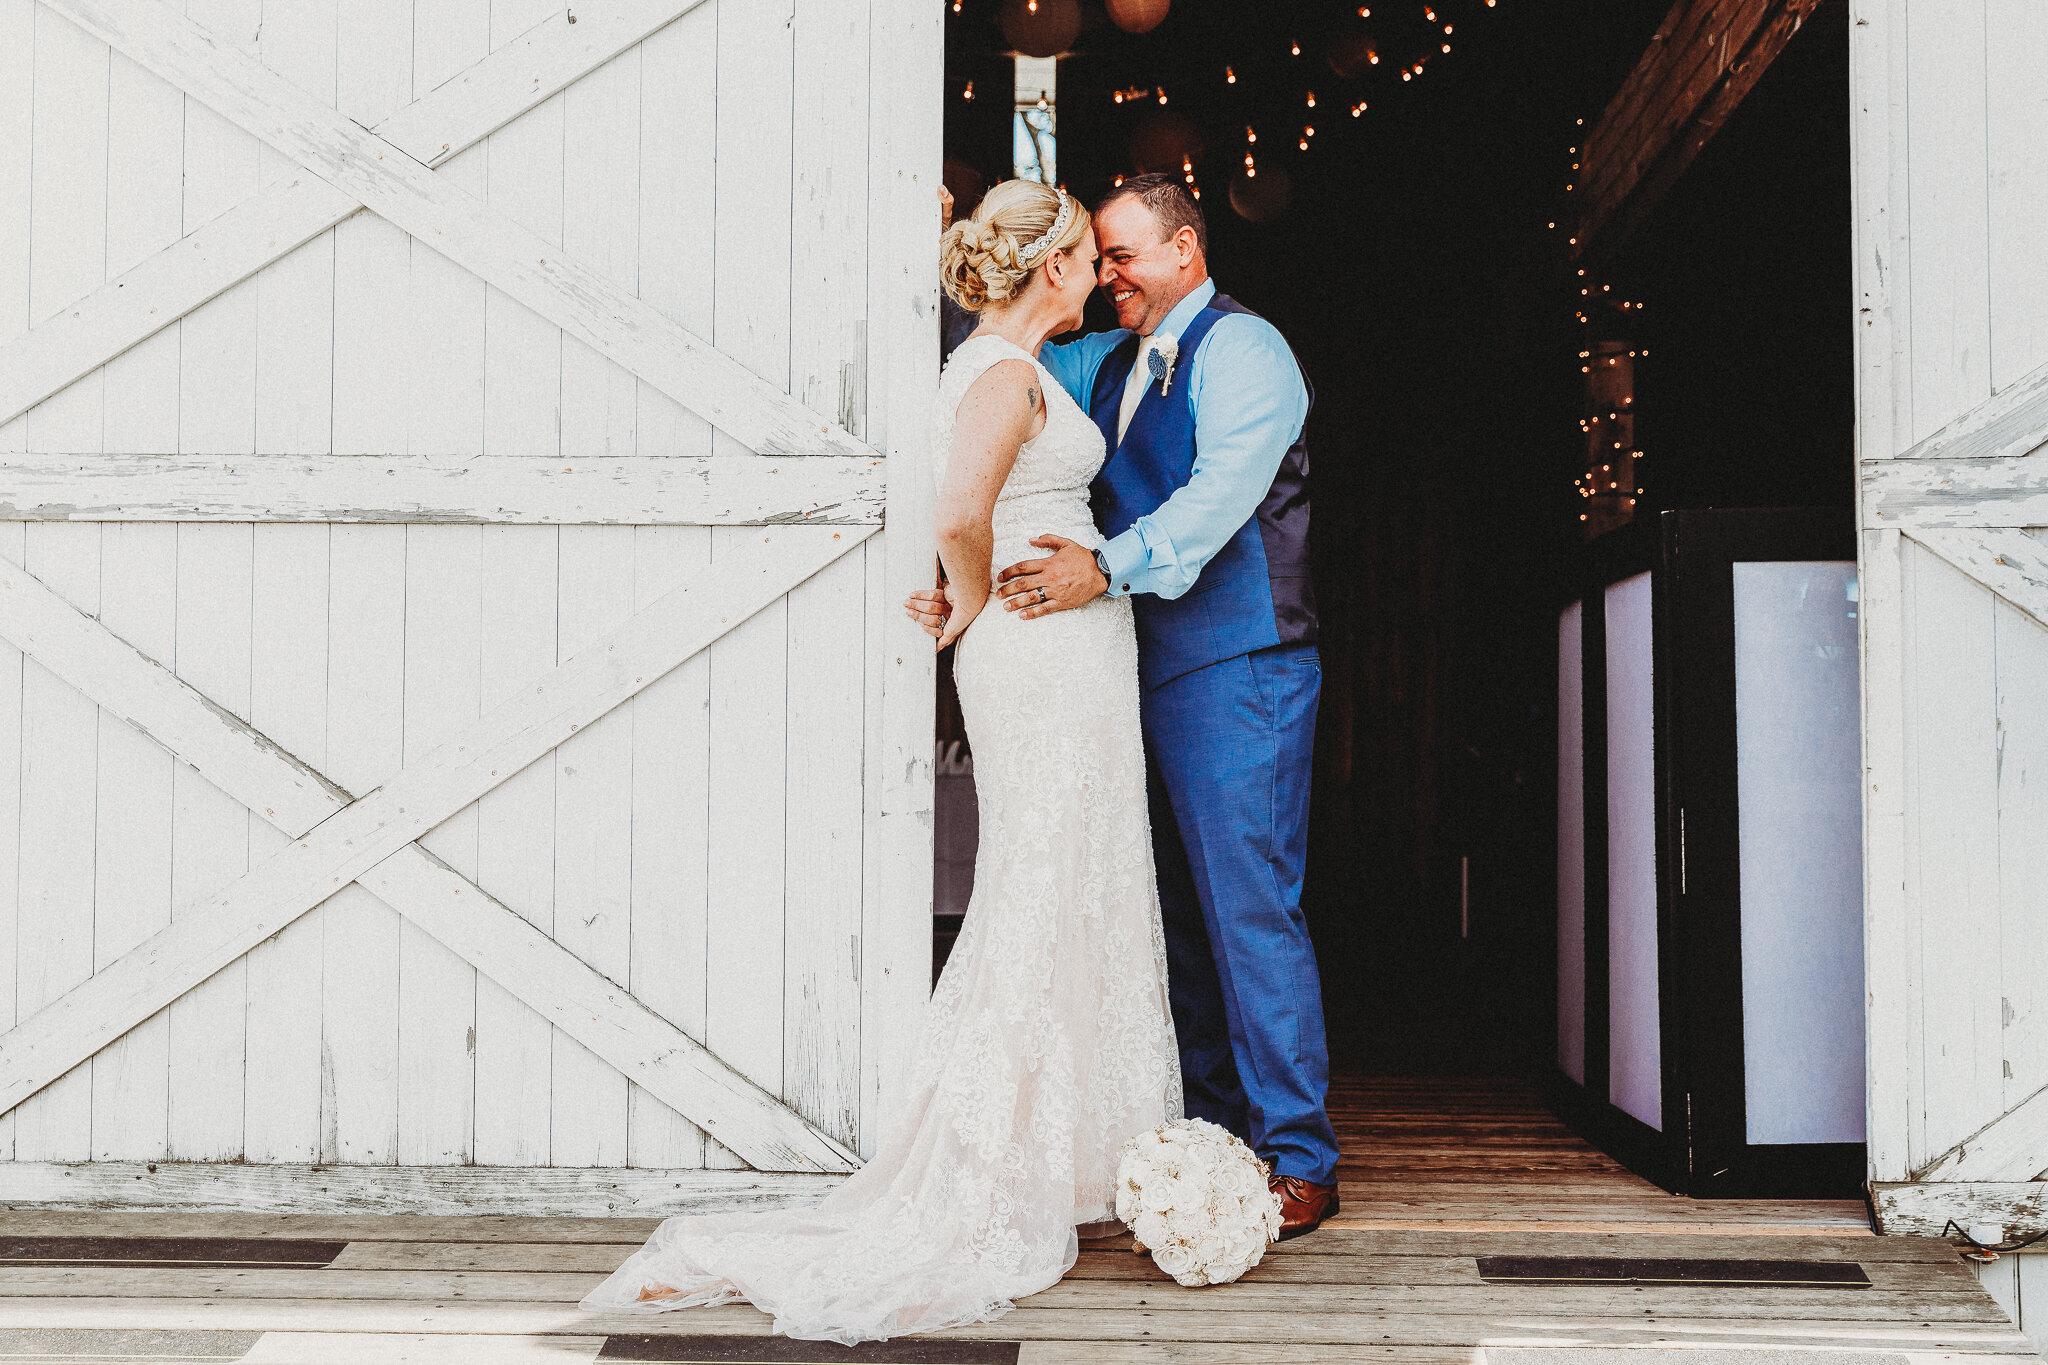 Shannon Lee Wedding Photography Long Island00025.jpg